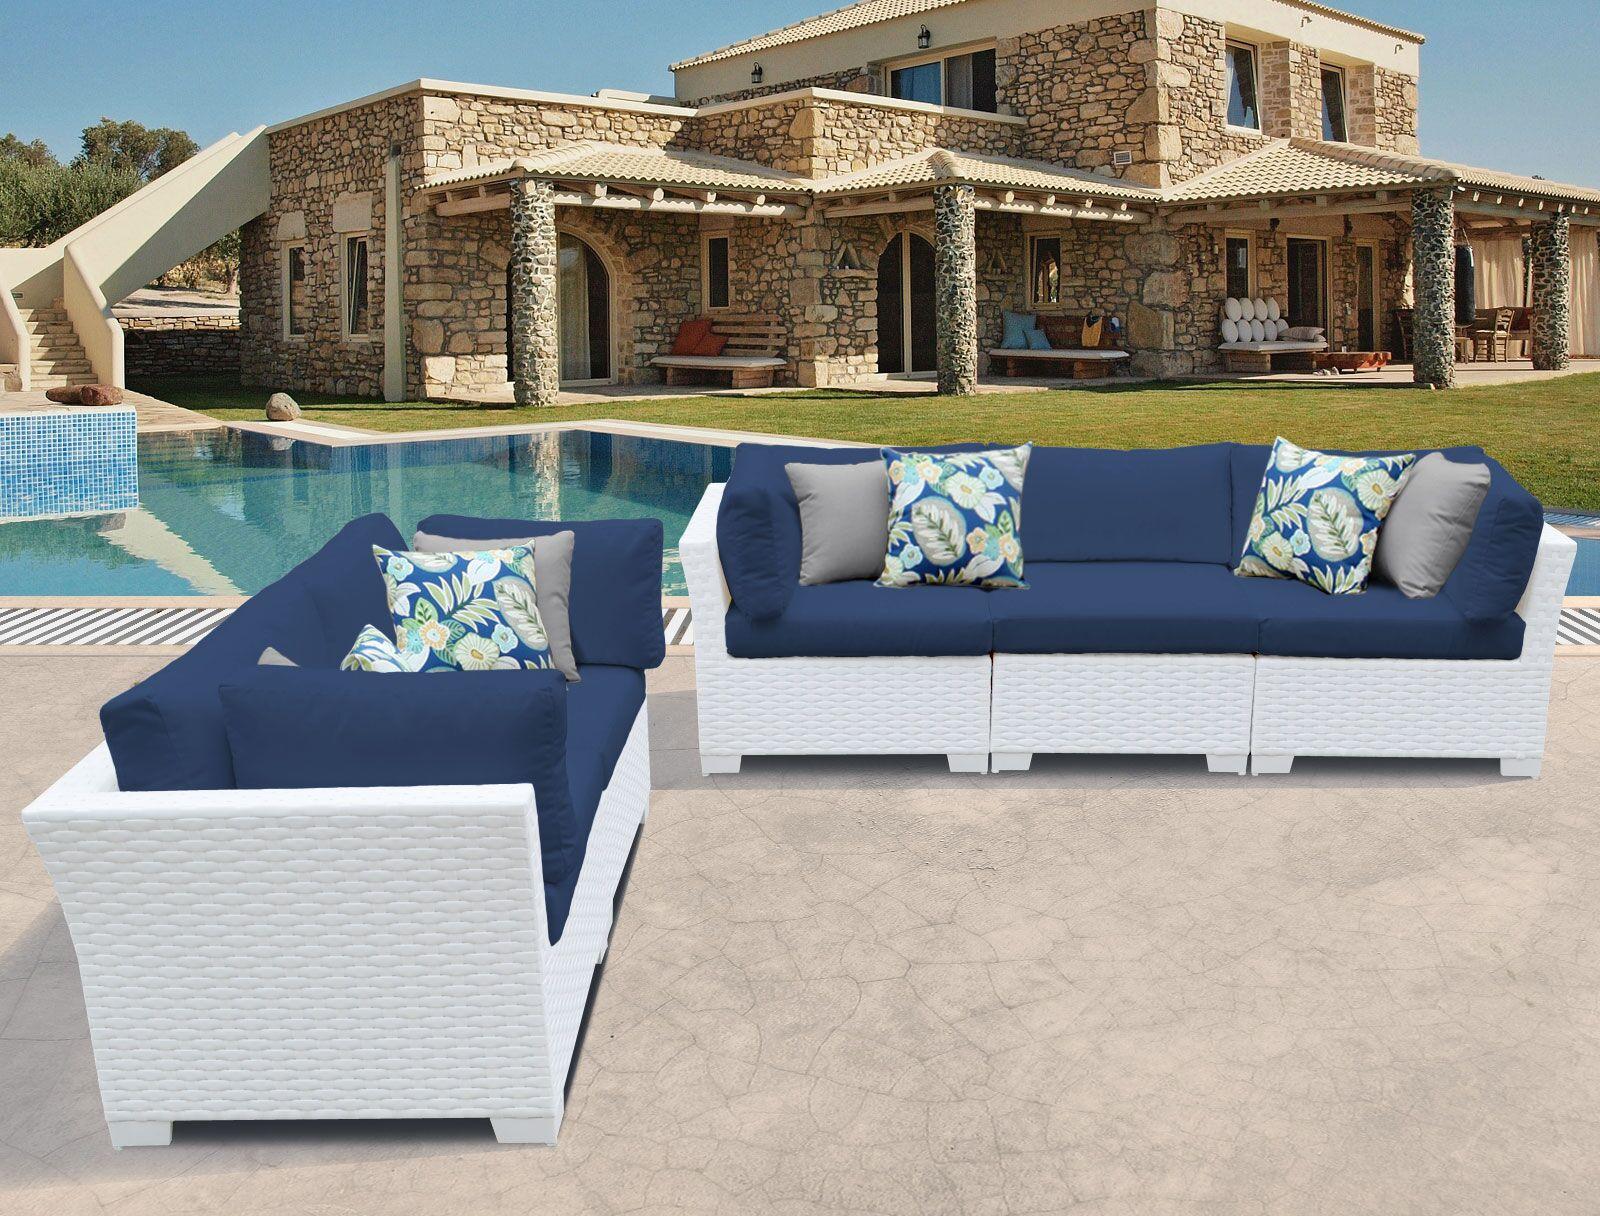 Monaco 5 Piece Sofa Set with Cushions Color: Navy